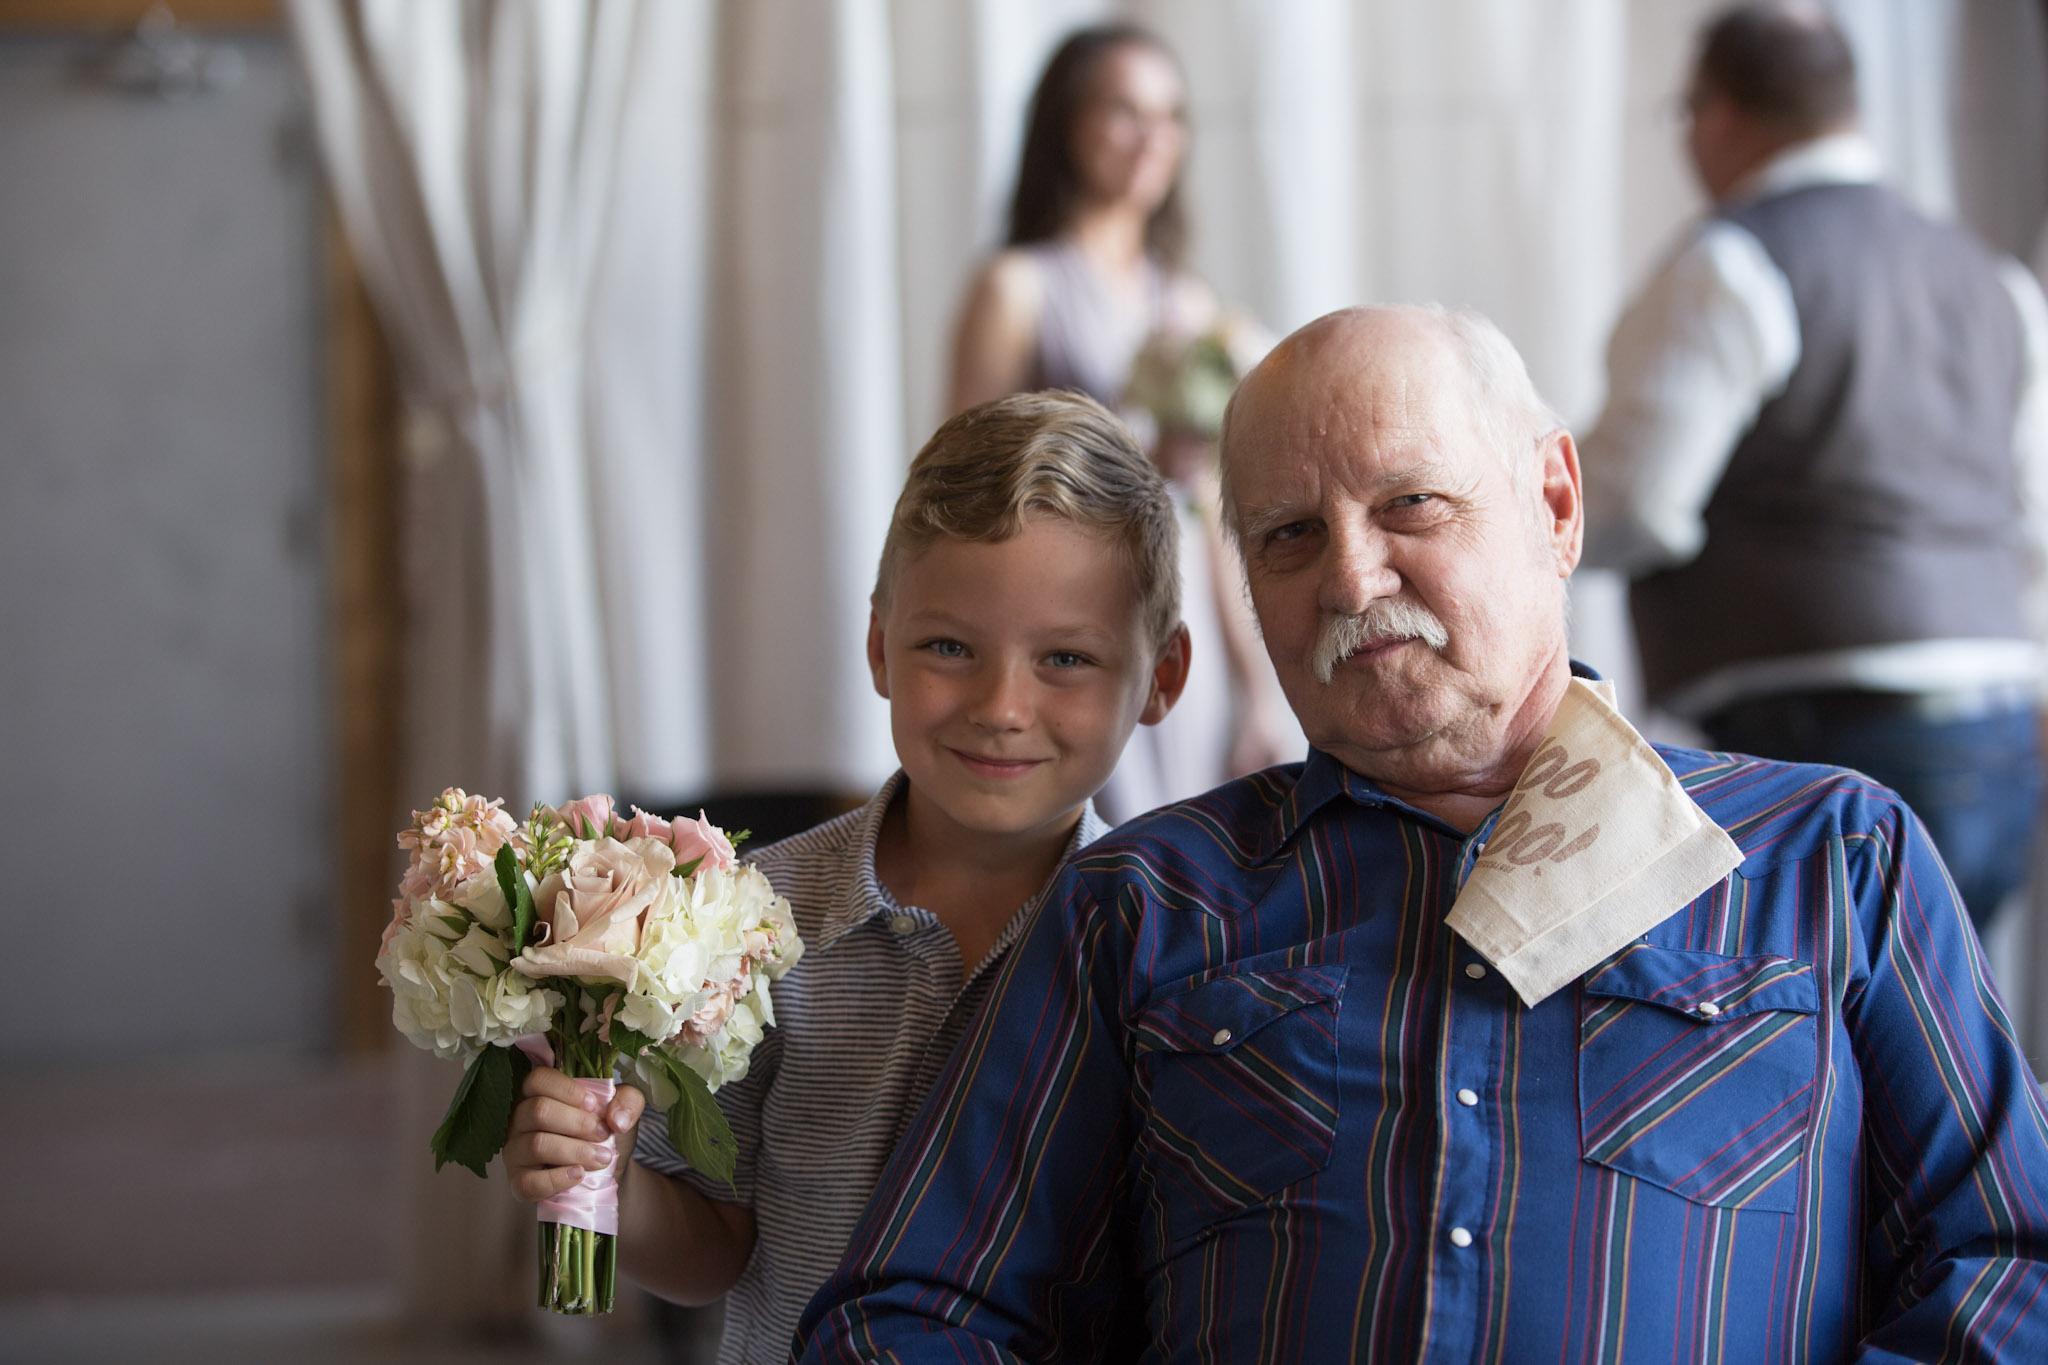 Kansas_City_Small_Wedding_Venue_Elope_Intimate_Ceremony_Budget_Affordable_KM4A9948VEX.JPG